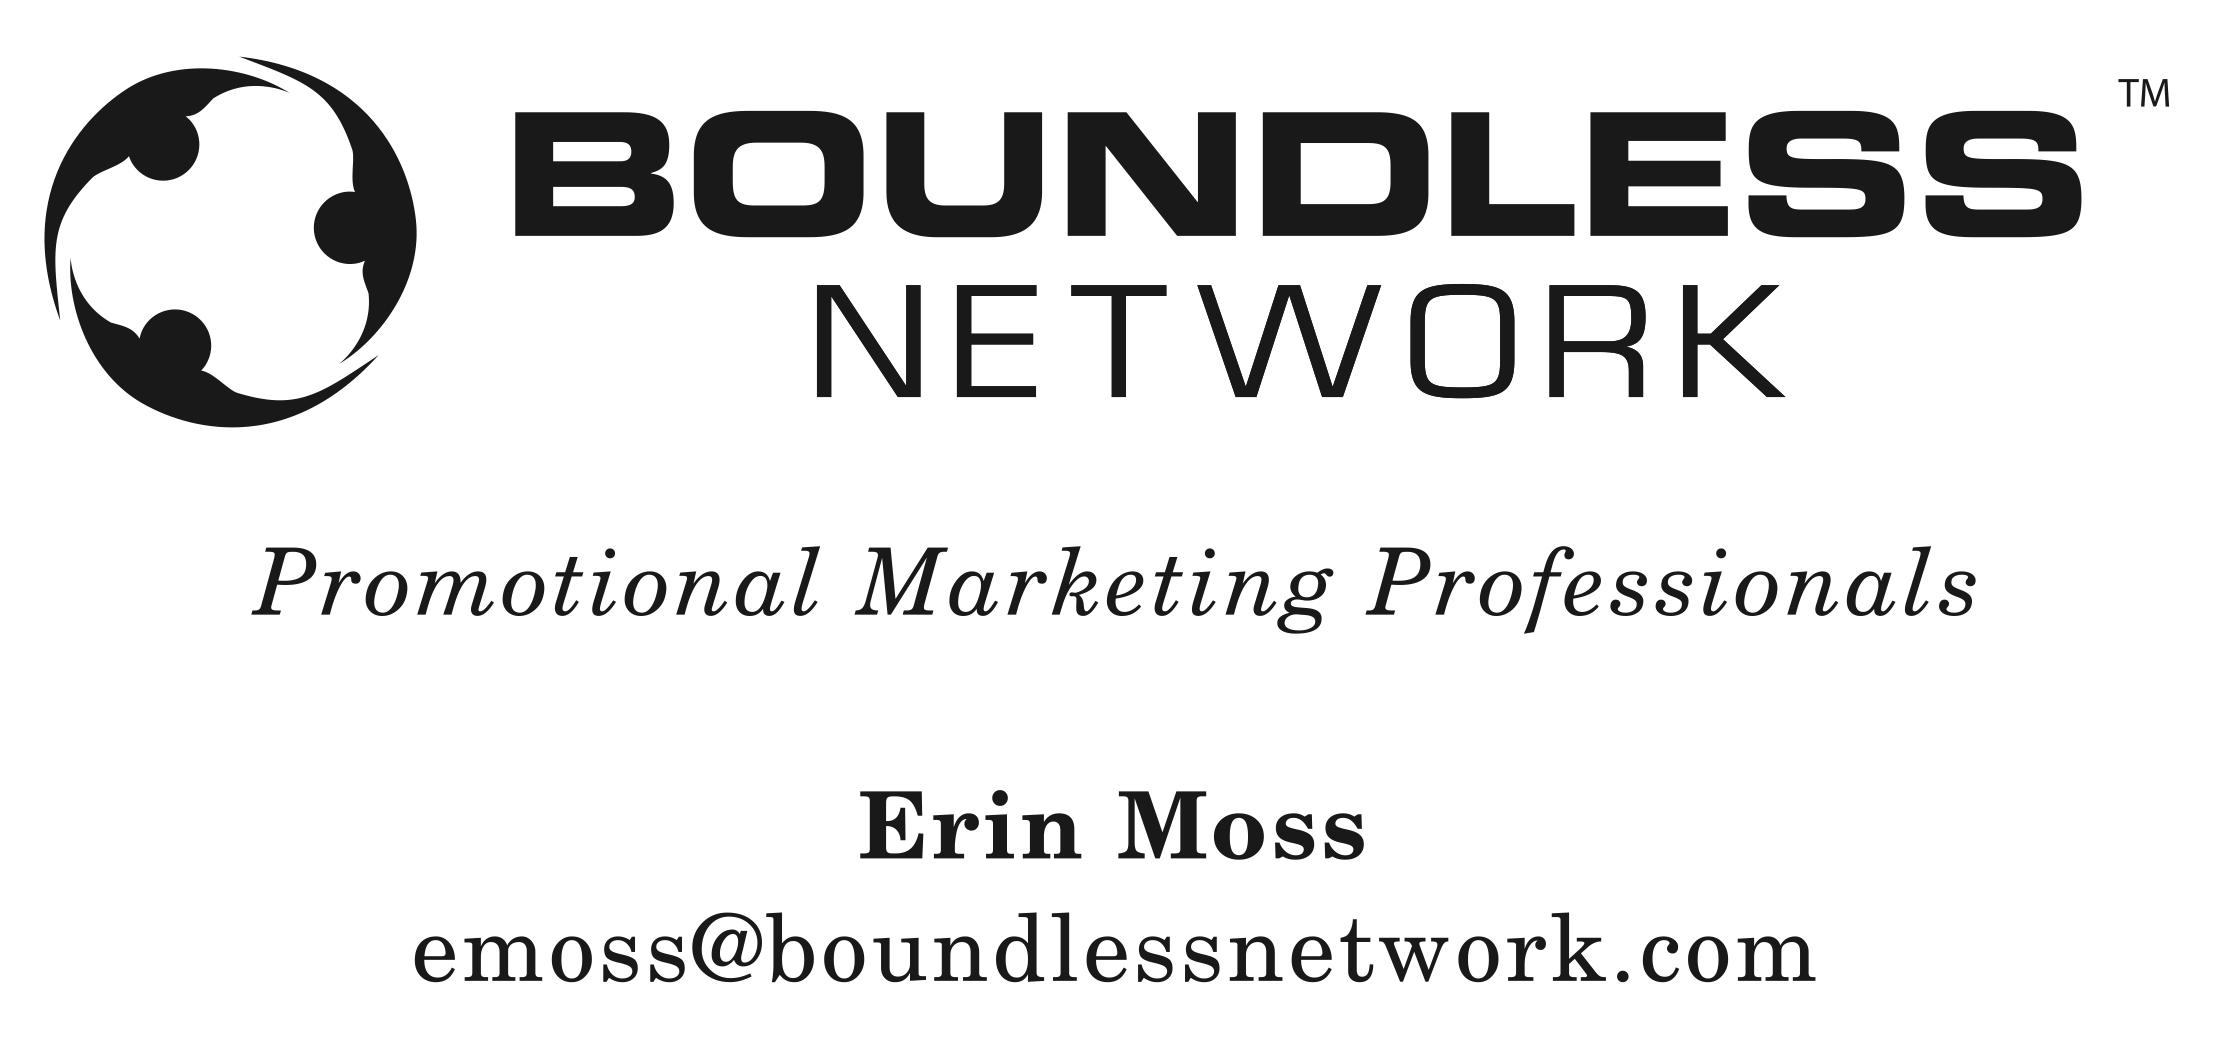 Boundless_horizontal_black with Professional Marketing tagline.jpg